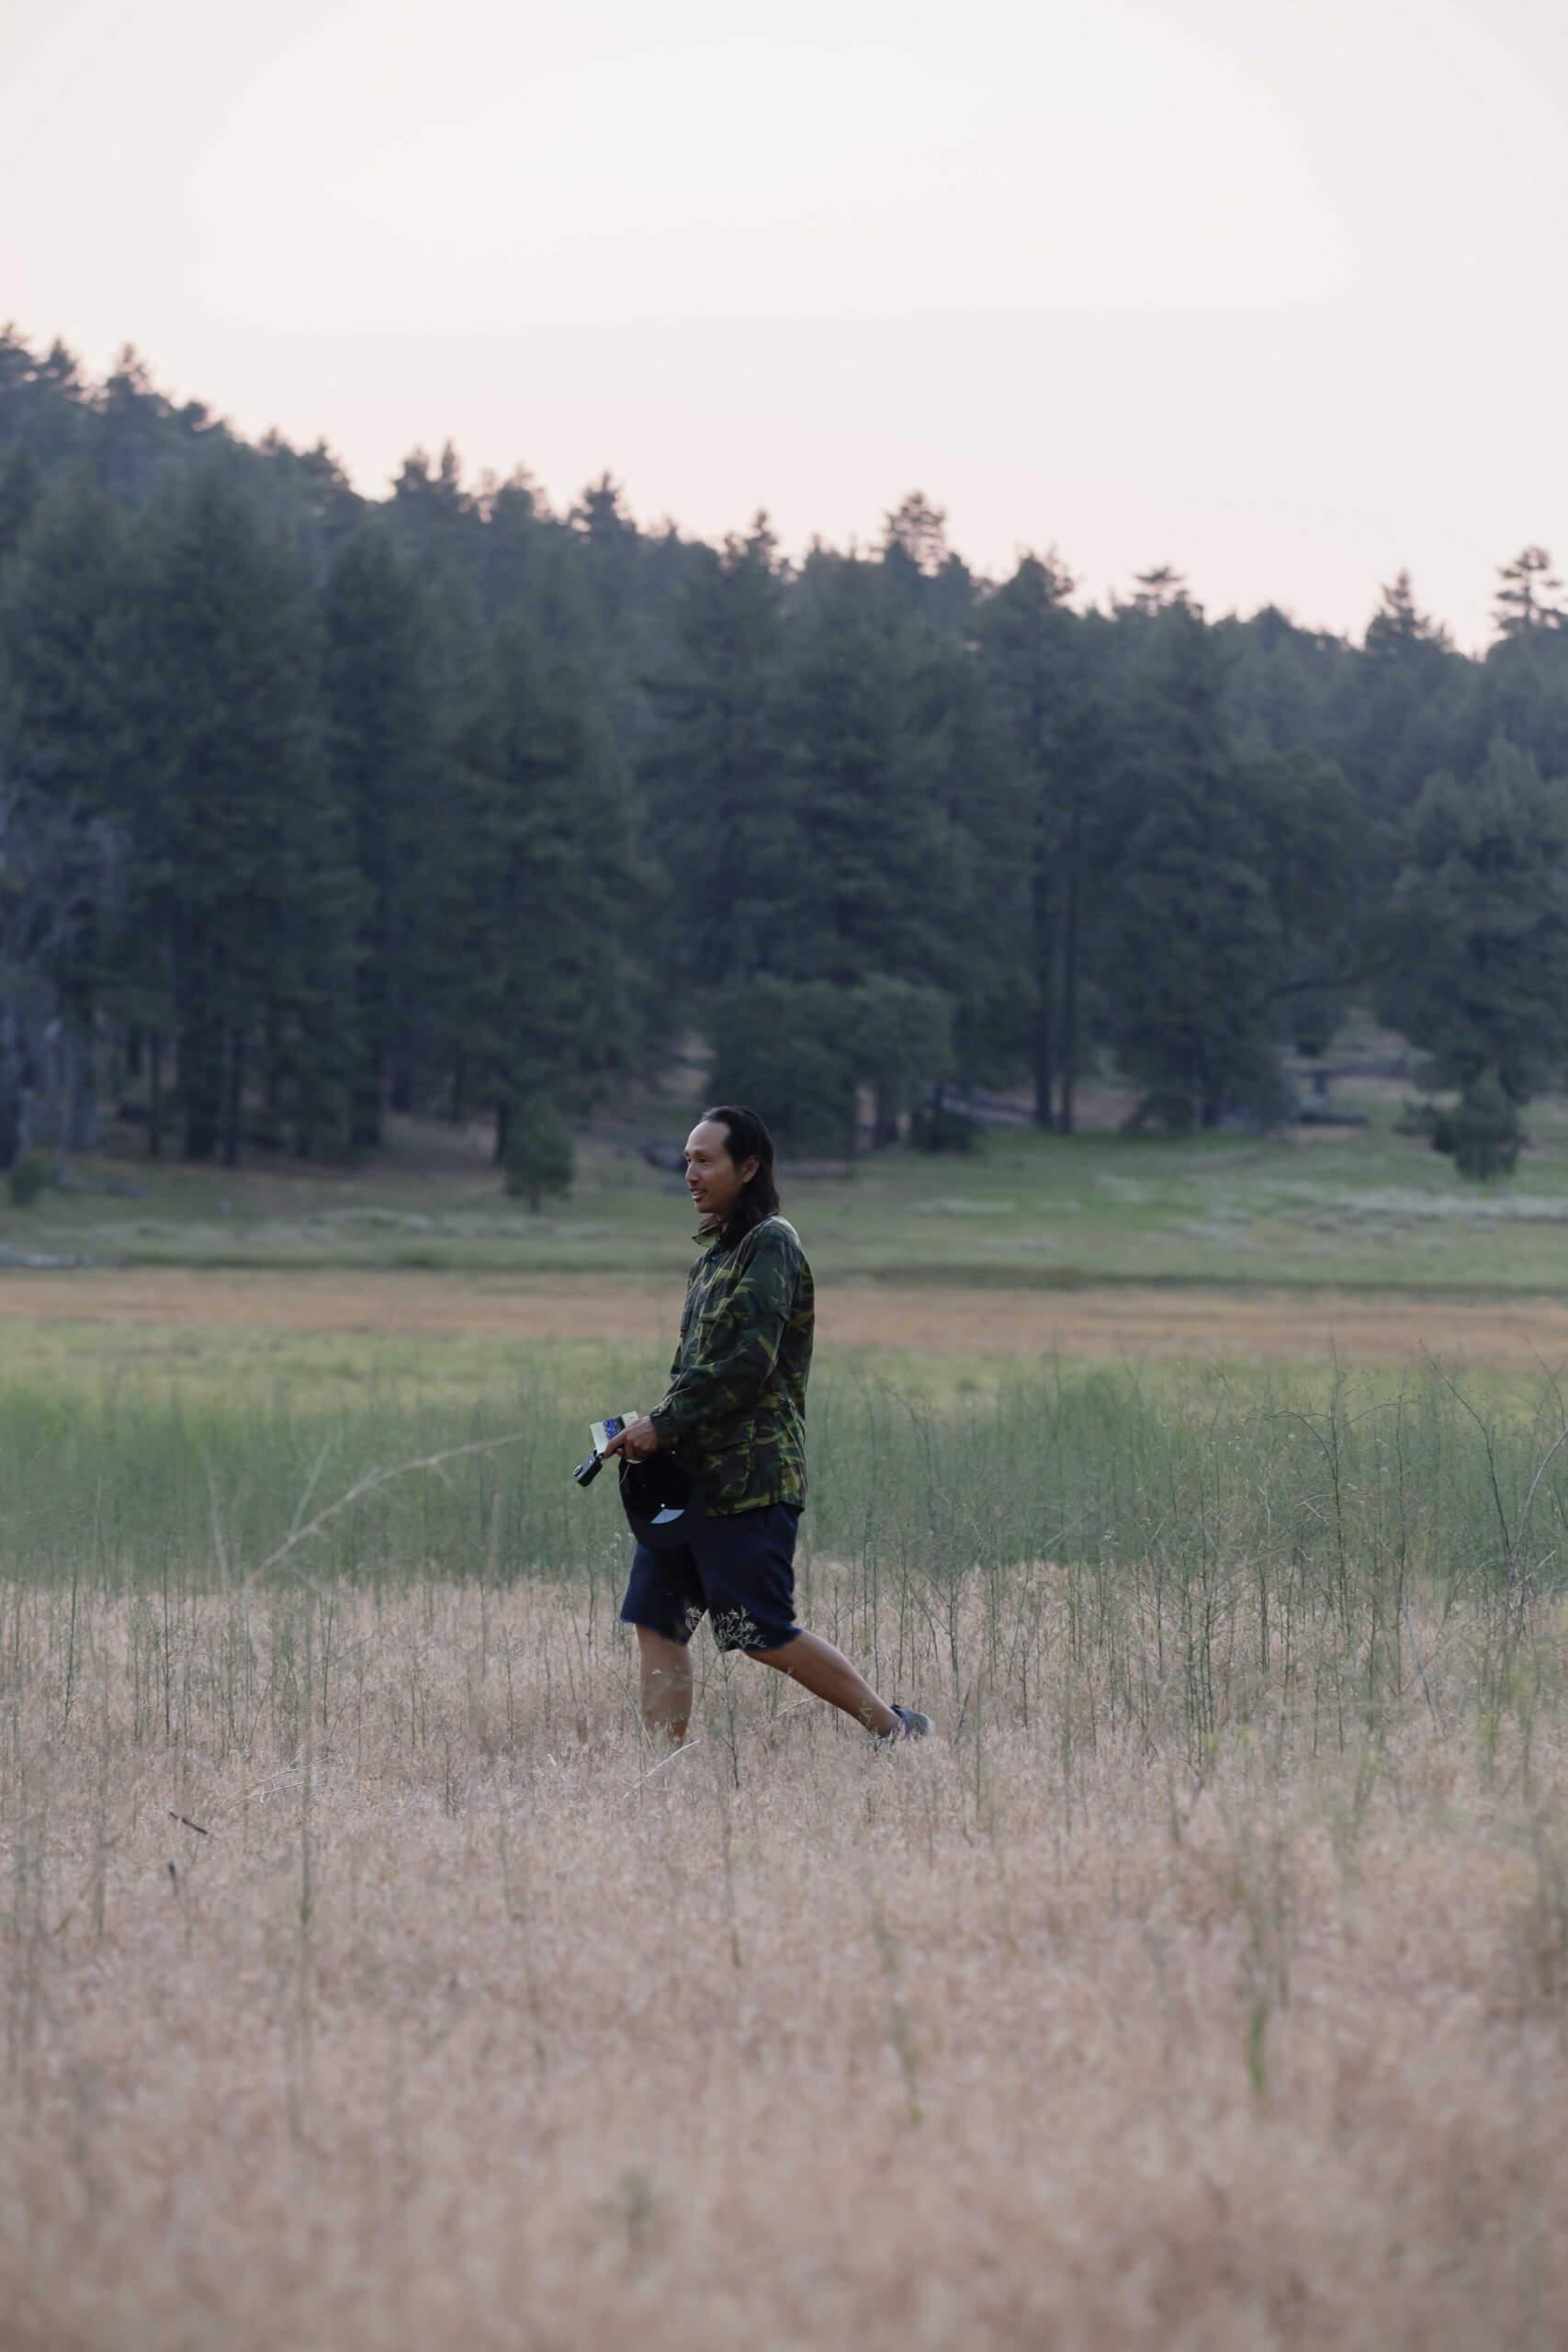 El Garvinski on the camping trip photo shoot